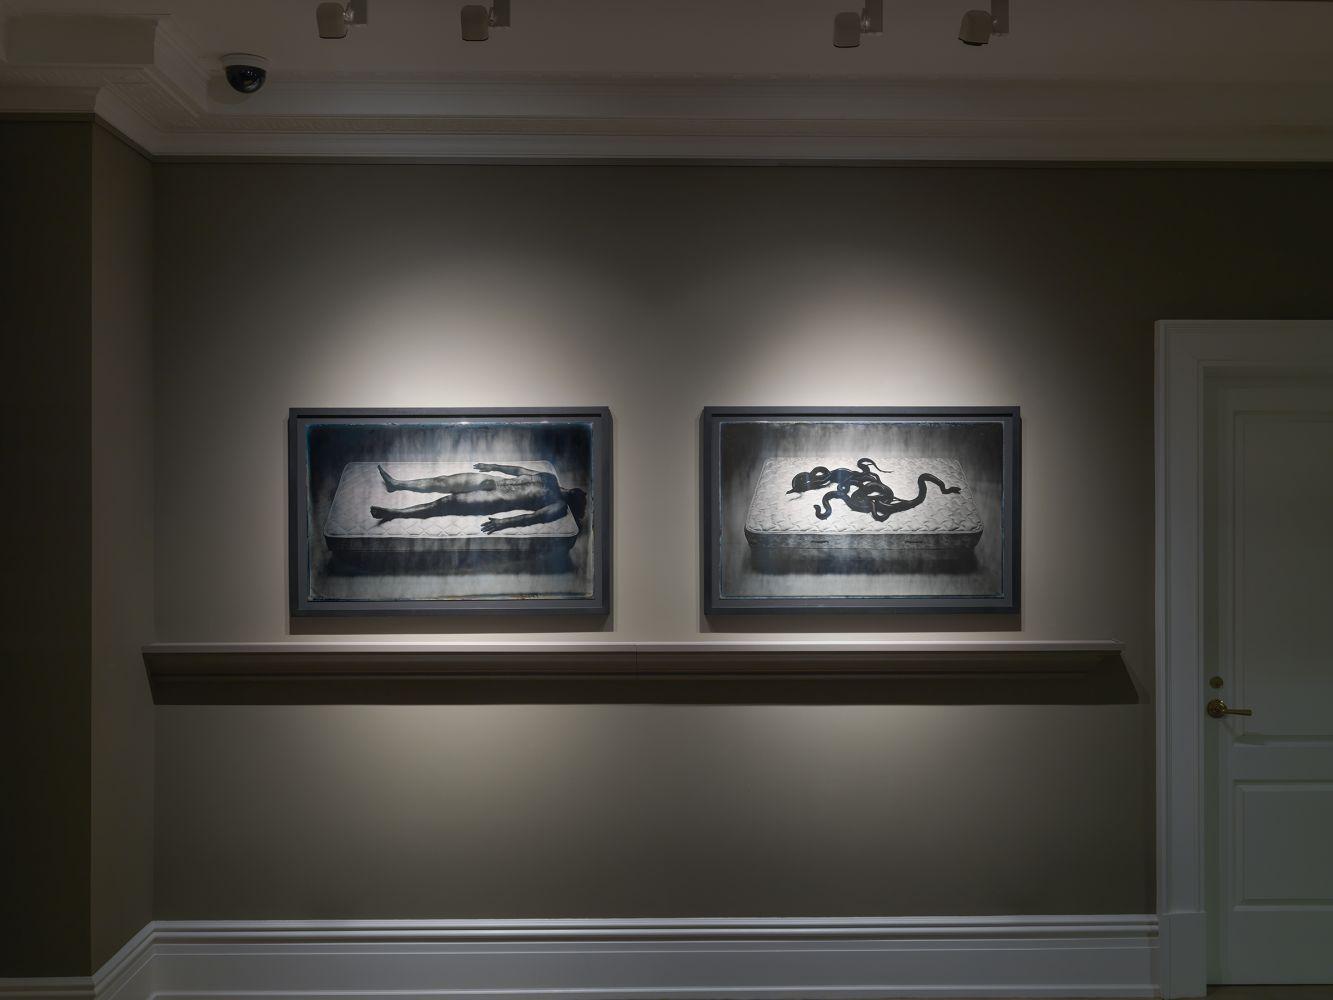 Adam Fuss Daguerreotypes The Womb of Pre-Raphaelite Imagination